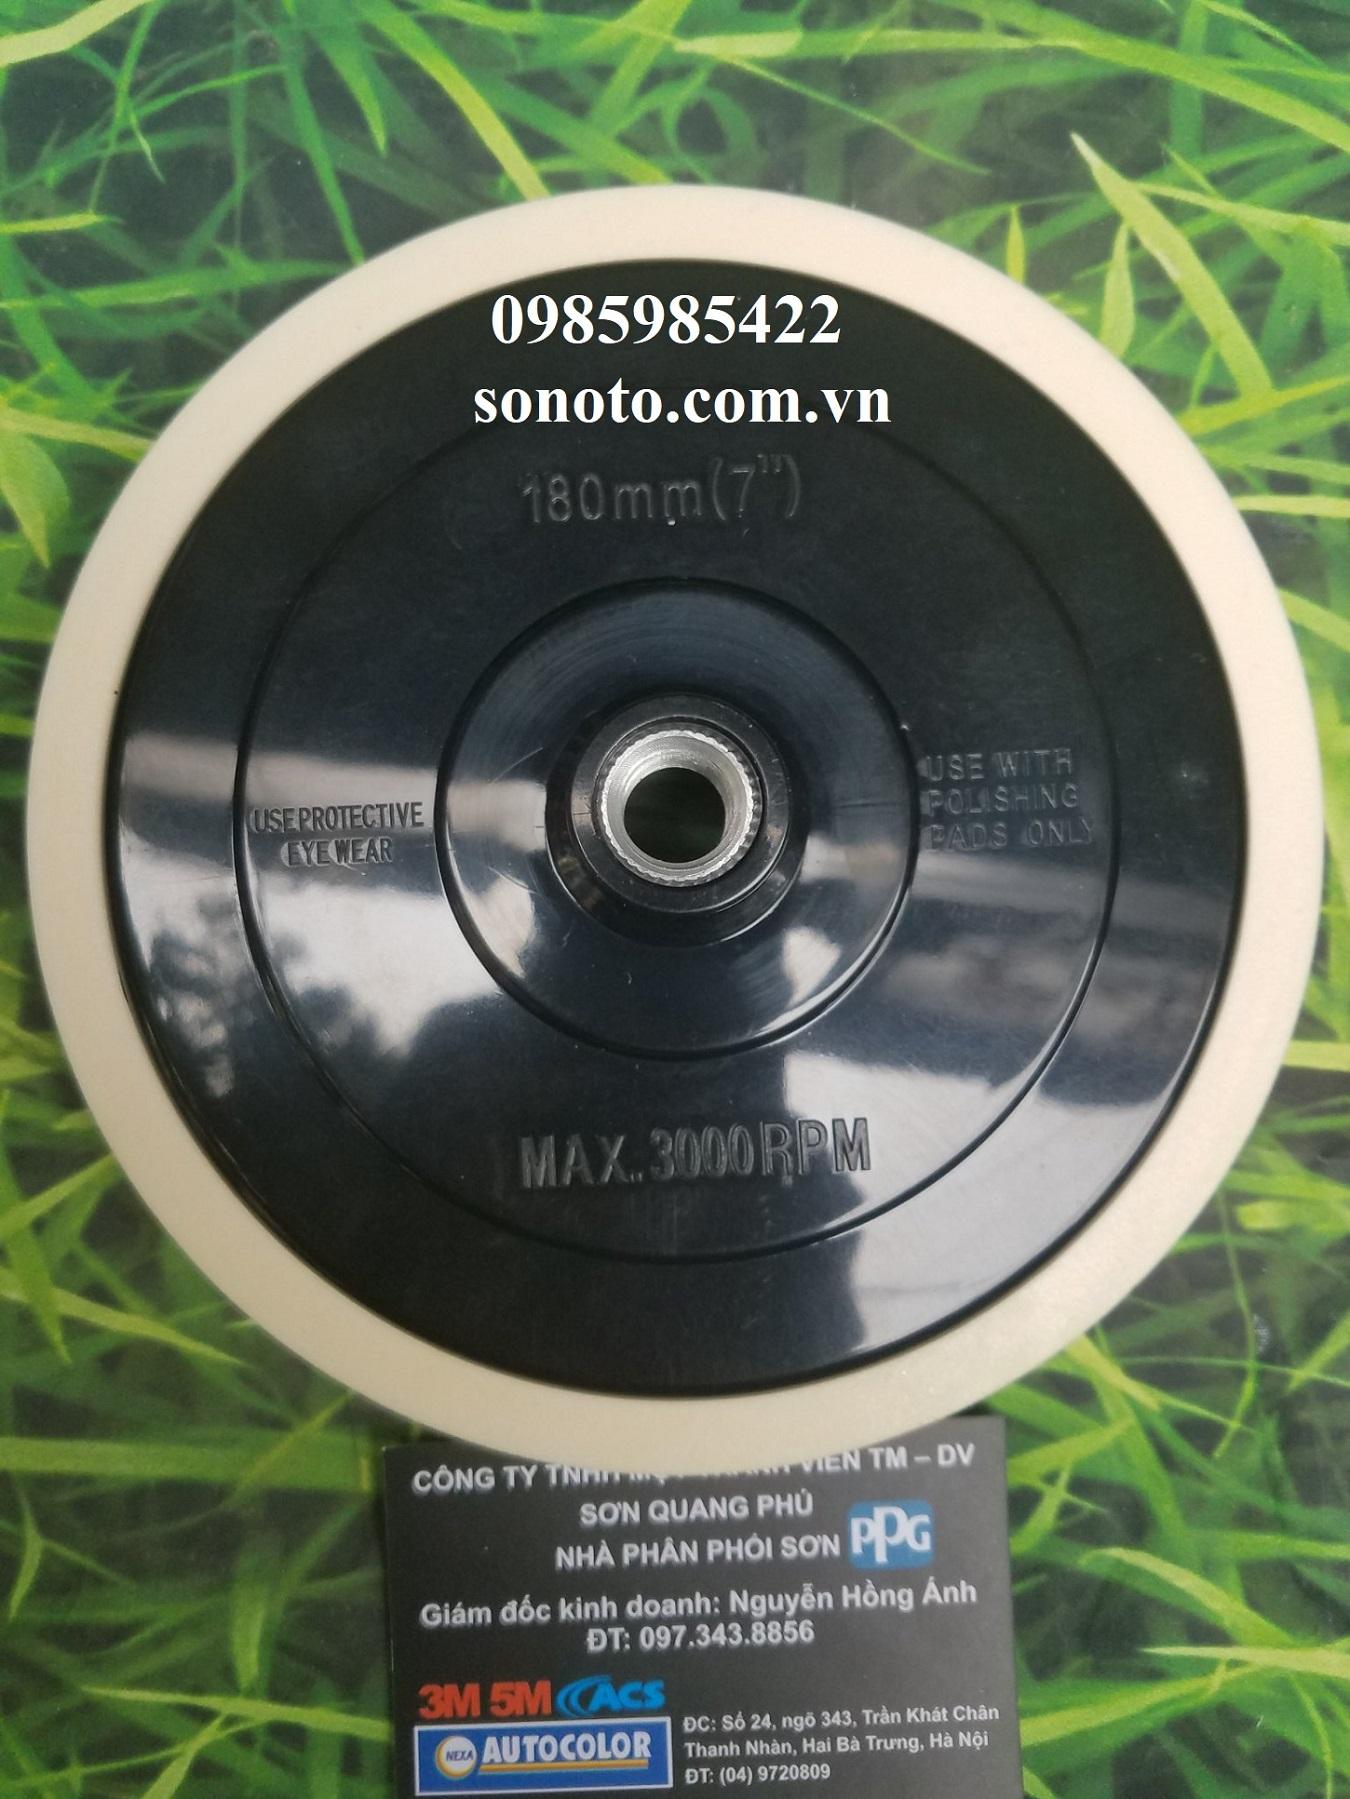 de-phot-thay-cho-may-danh-bong-7inch-180mm-gien-16